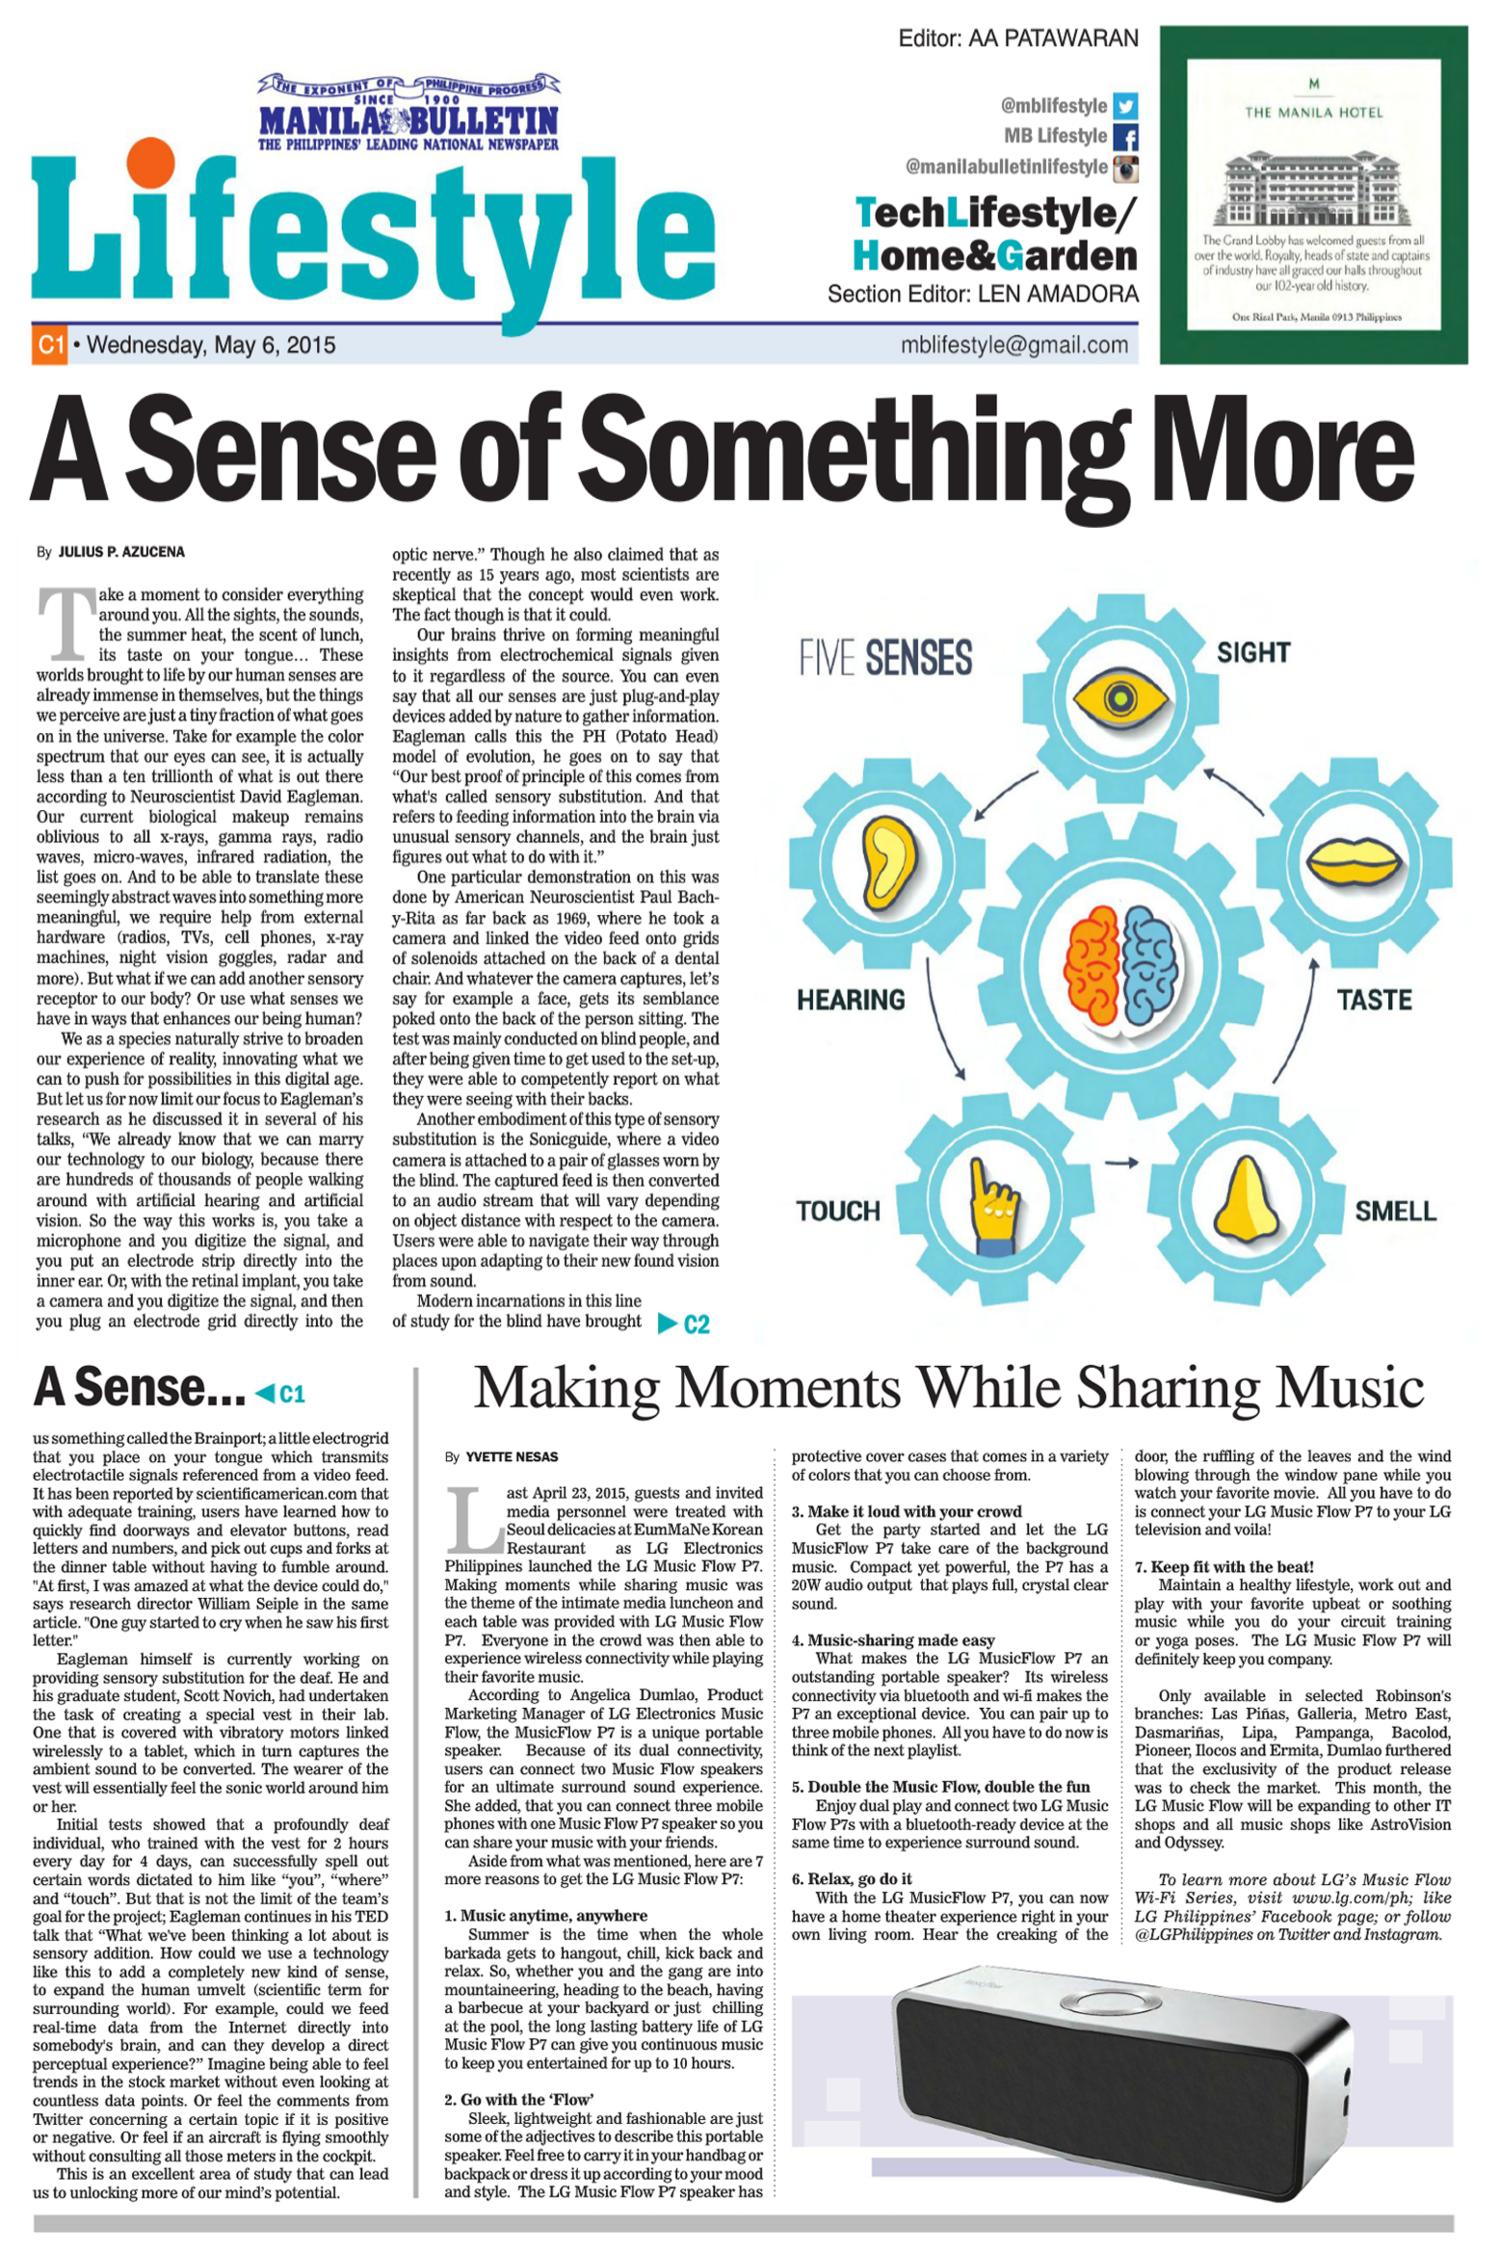 MB Article #19 - A Sense of Something More — Julius Azucena